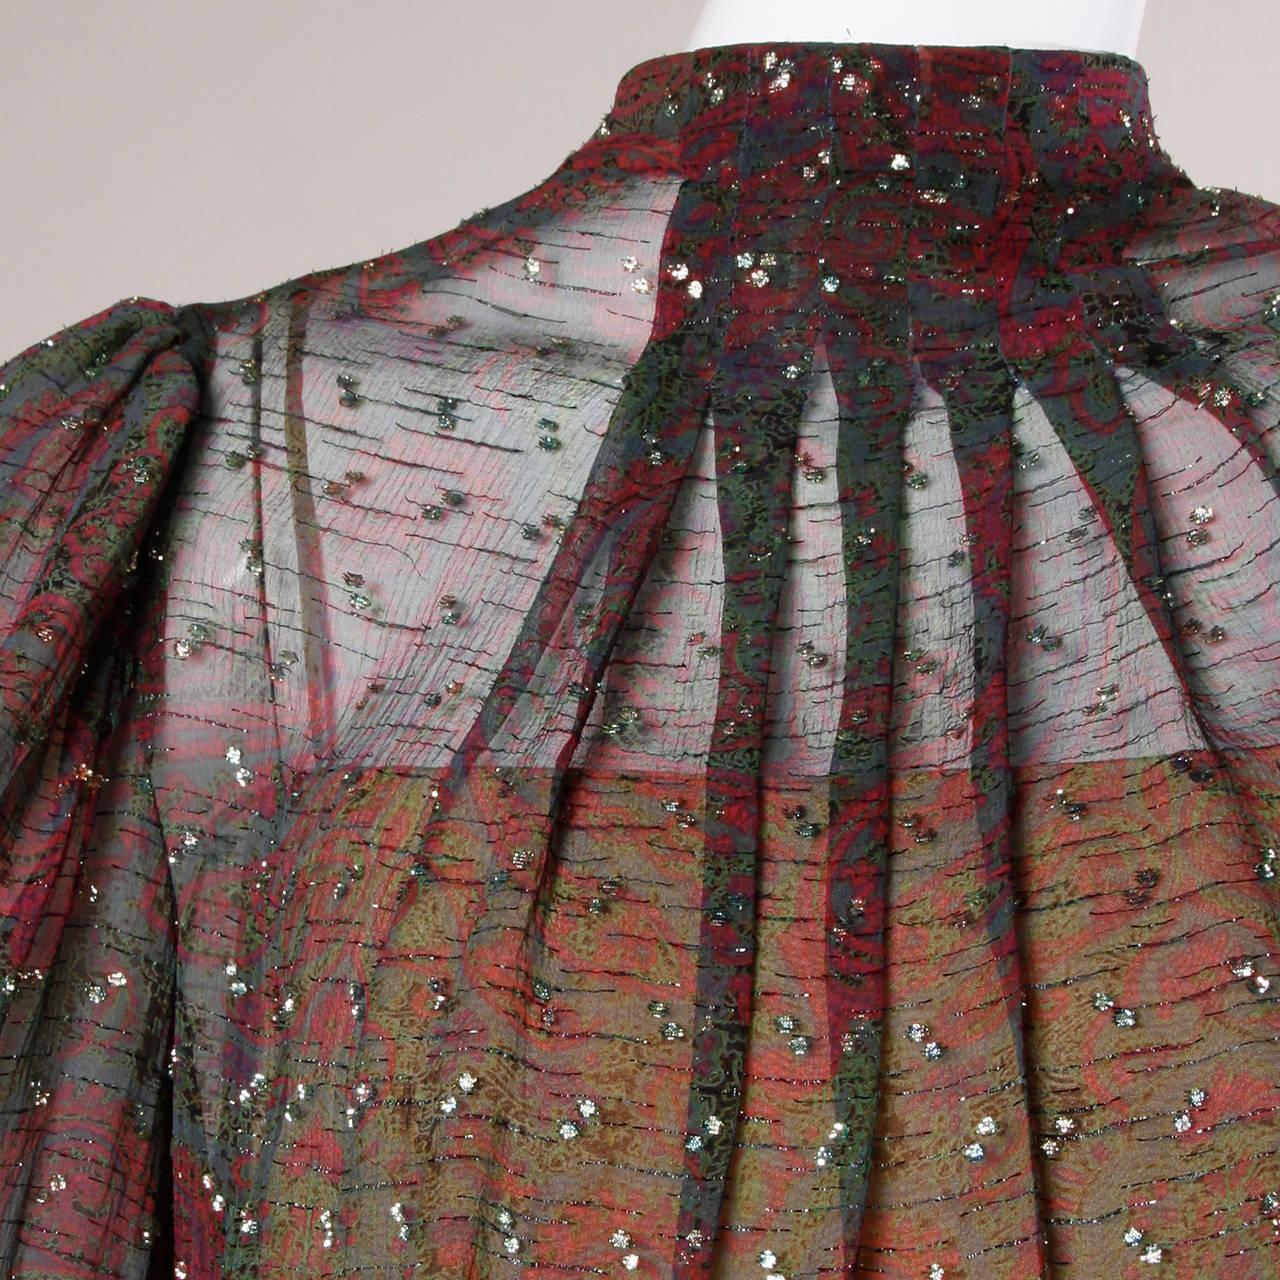 Black Pauline Trigere Vintage 1970s Metallic Silk 3-Piece Dress + Sash For Sale